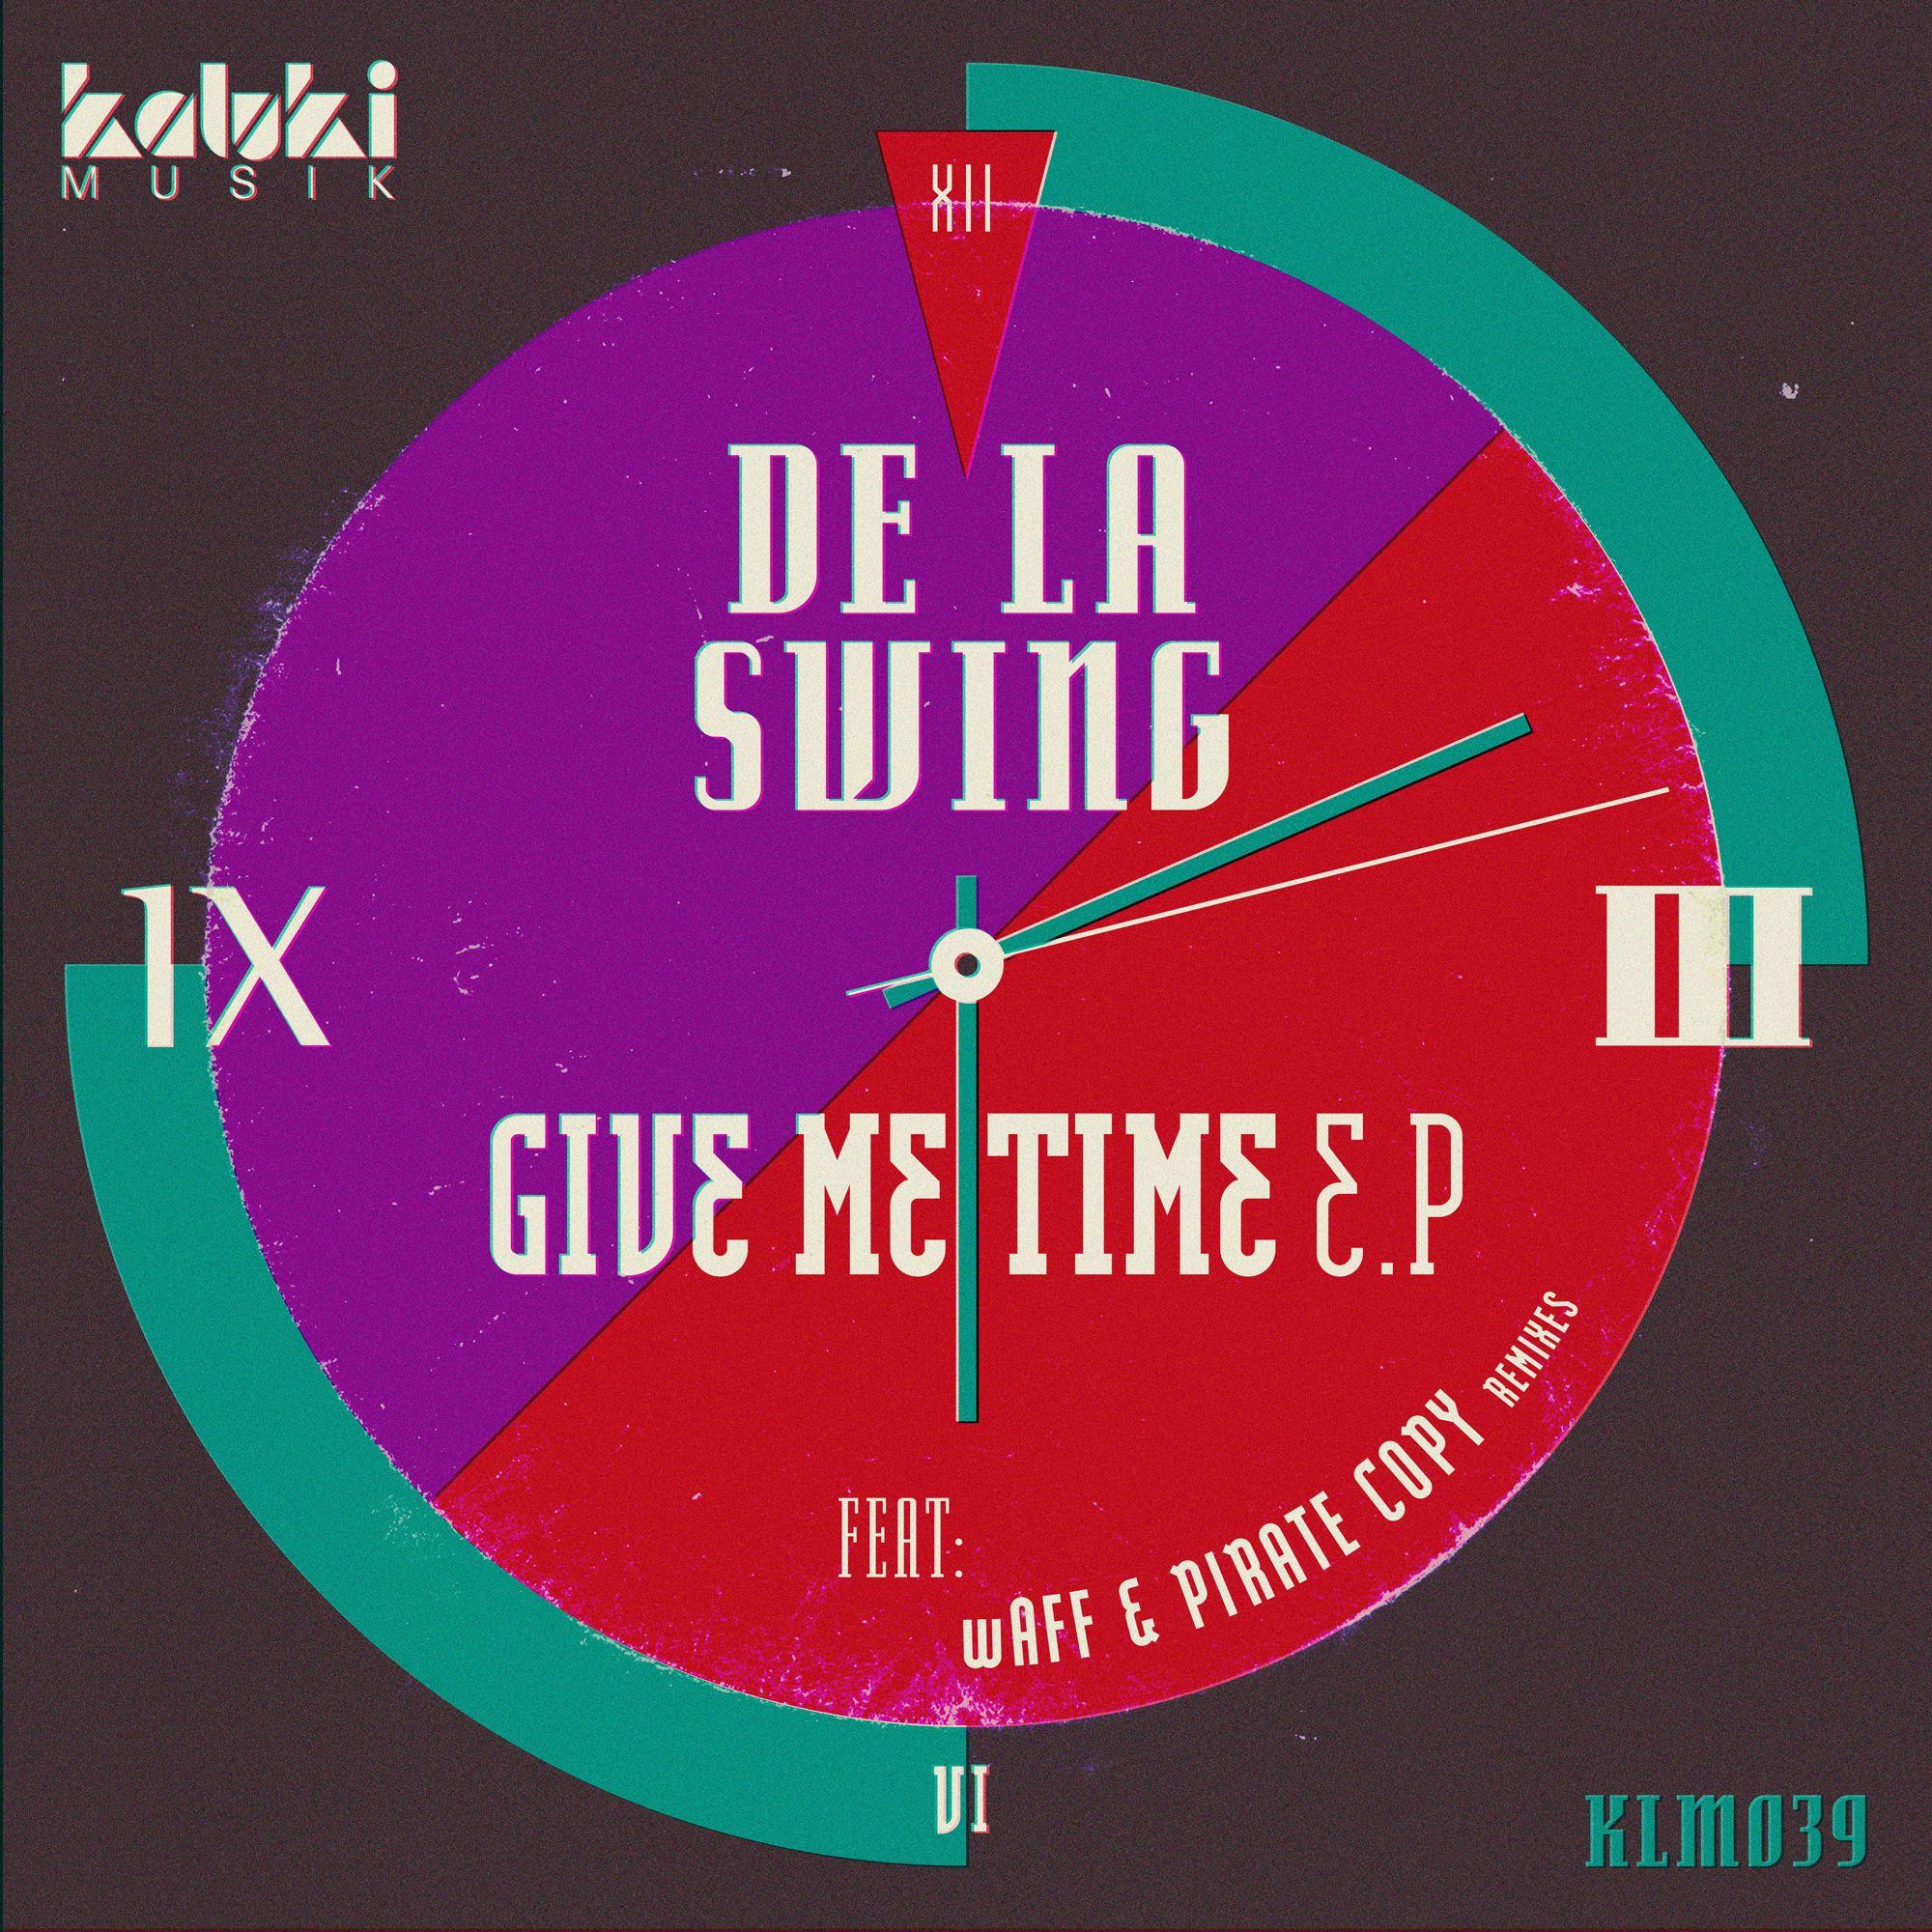 packshot_de_la_swing_-_give_me_time_ep_-_kaluki_musik.jpg